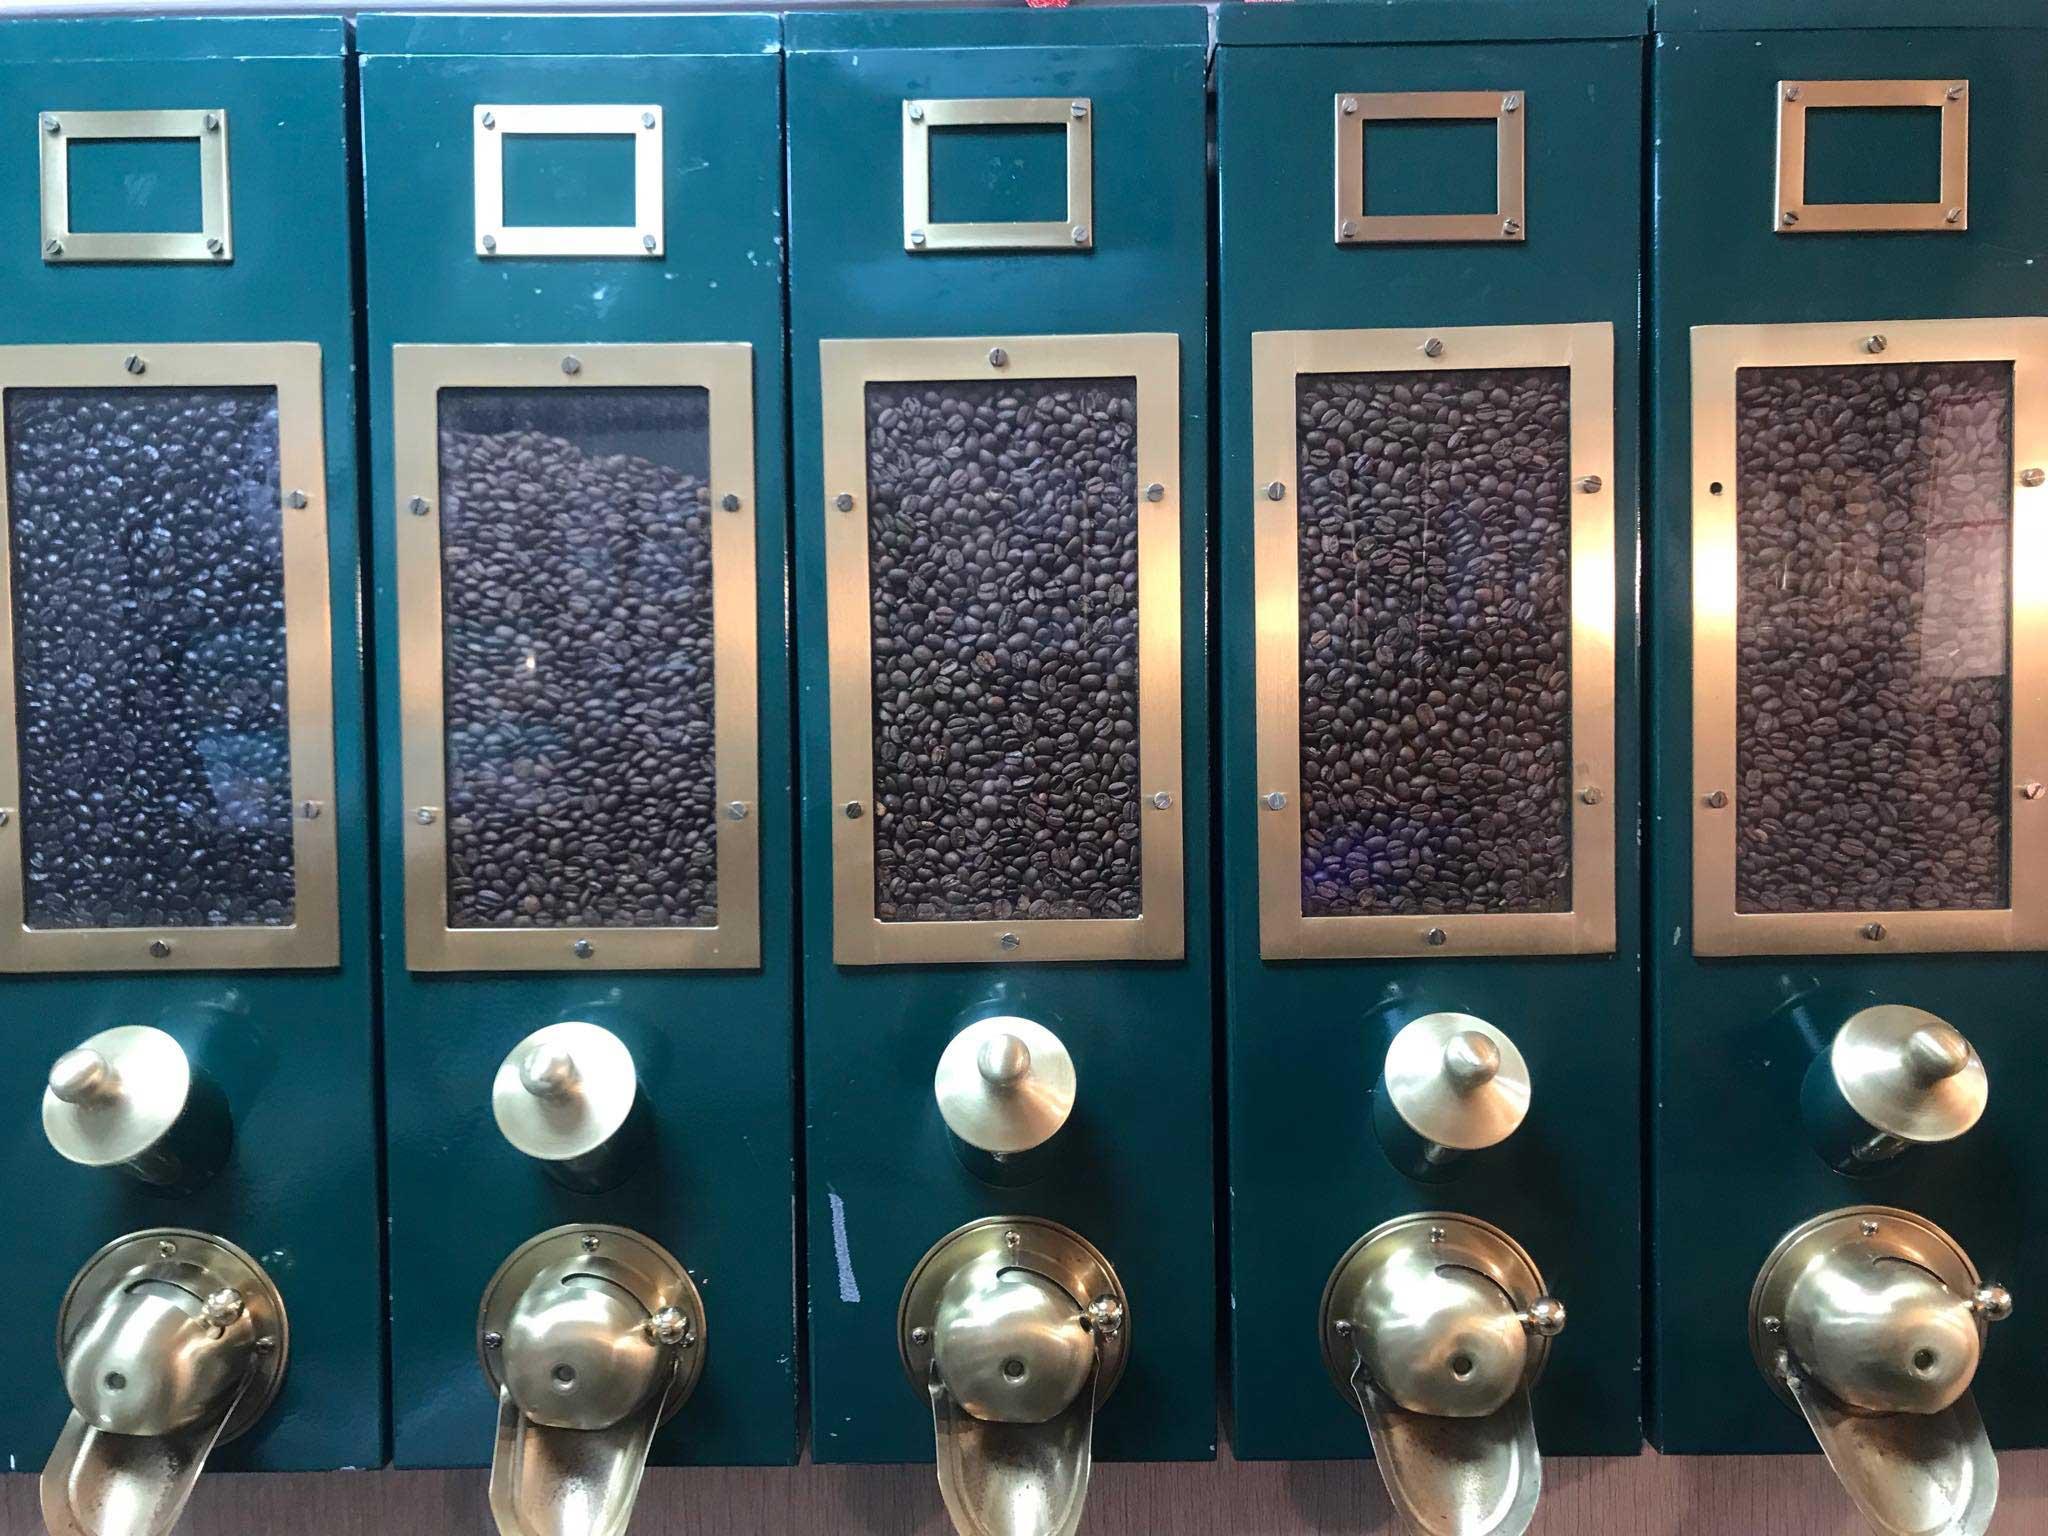 Aroma de Café colaborador de Chocolate Gueysh